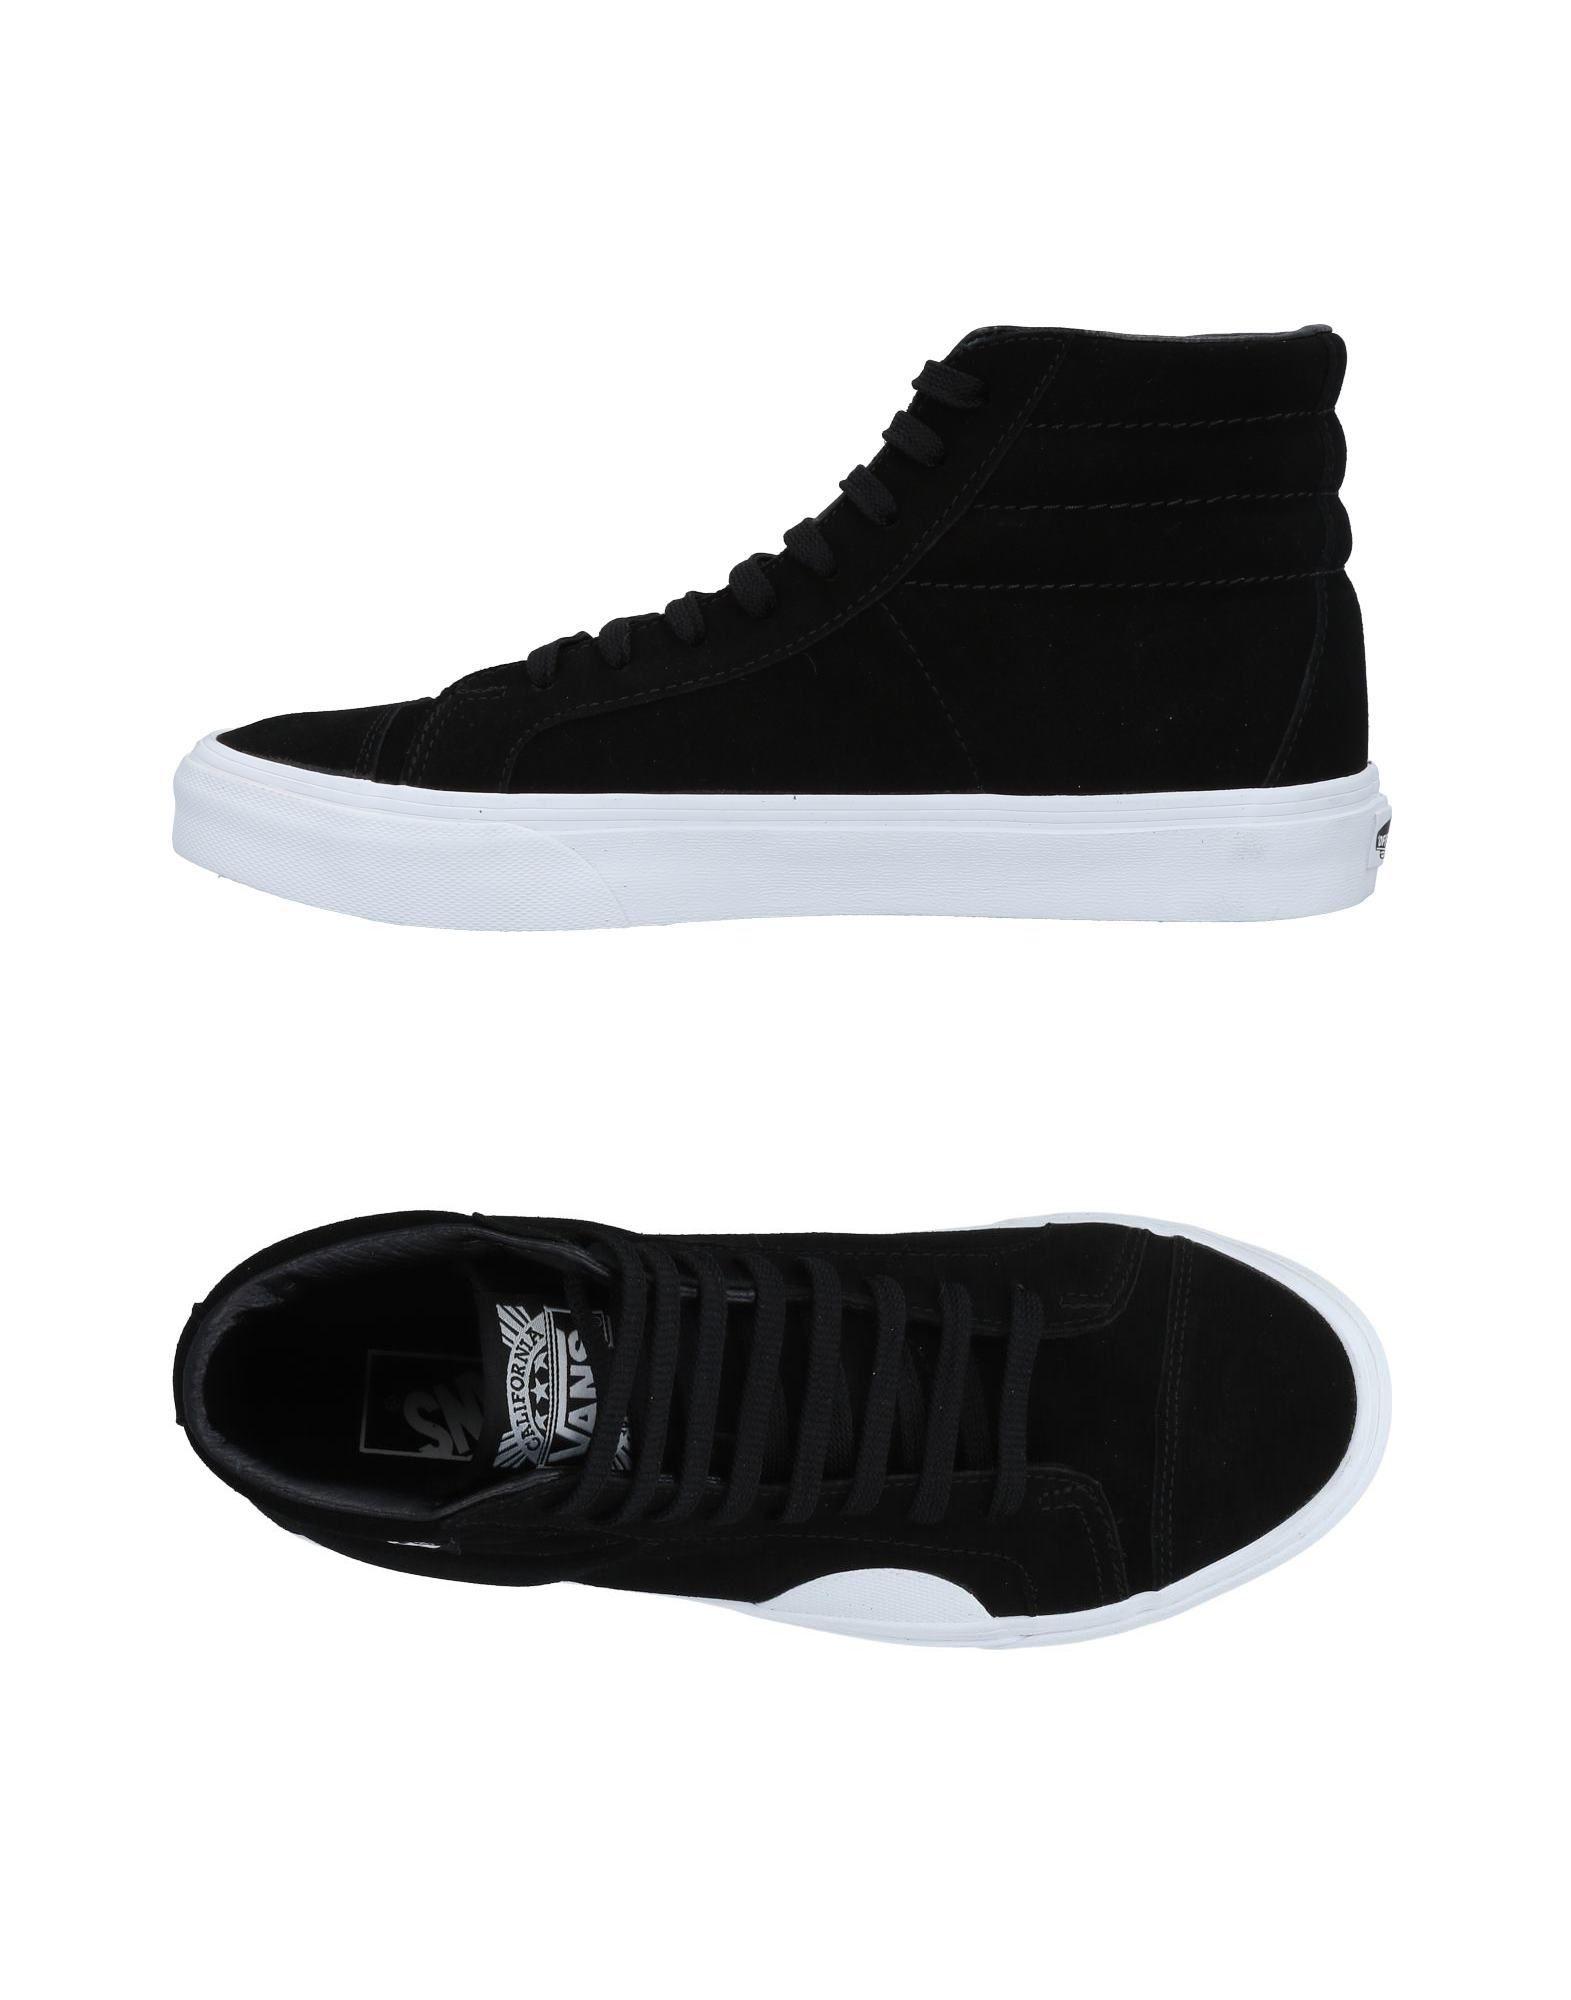 Vans  Sneakers - Men Vans Sneakers online on  Vans United Kingdom - 11491901BQ f537aa